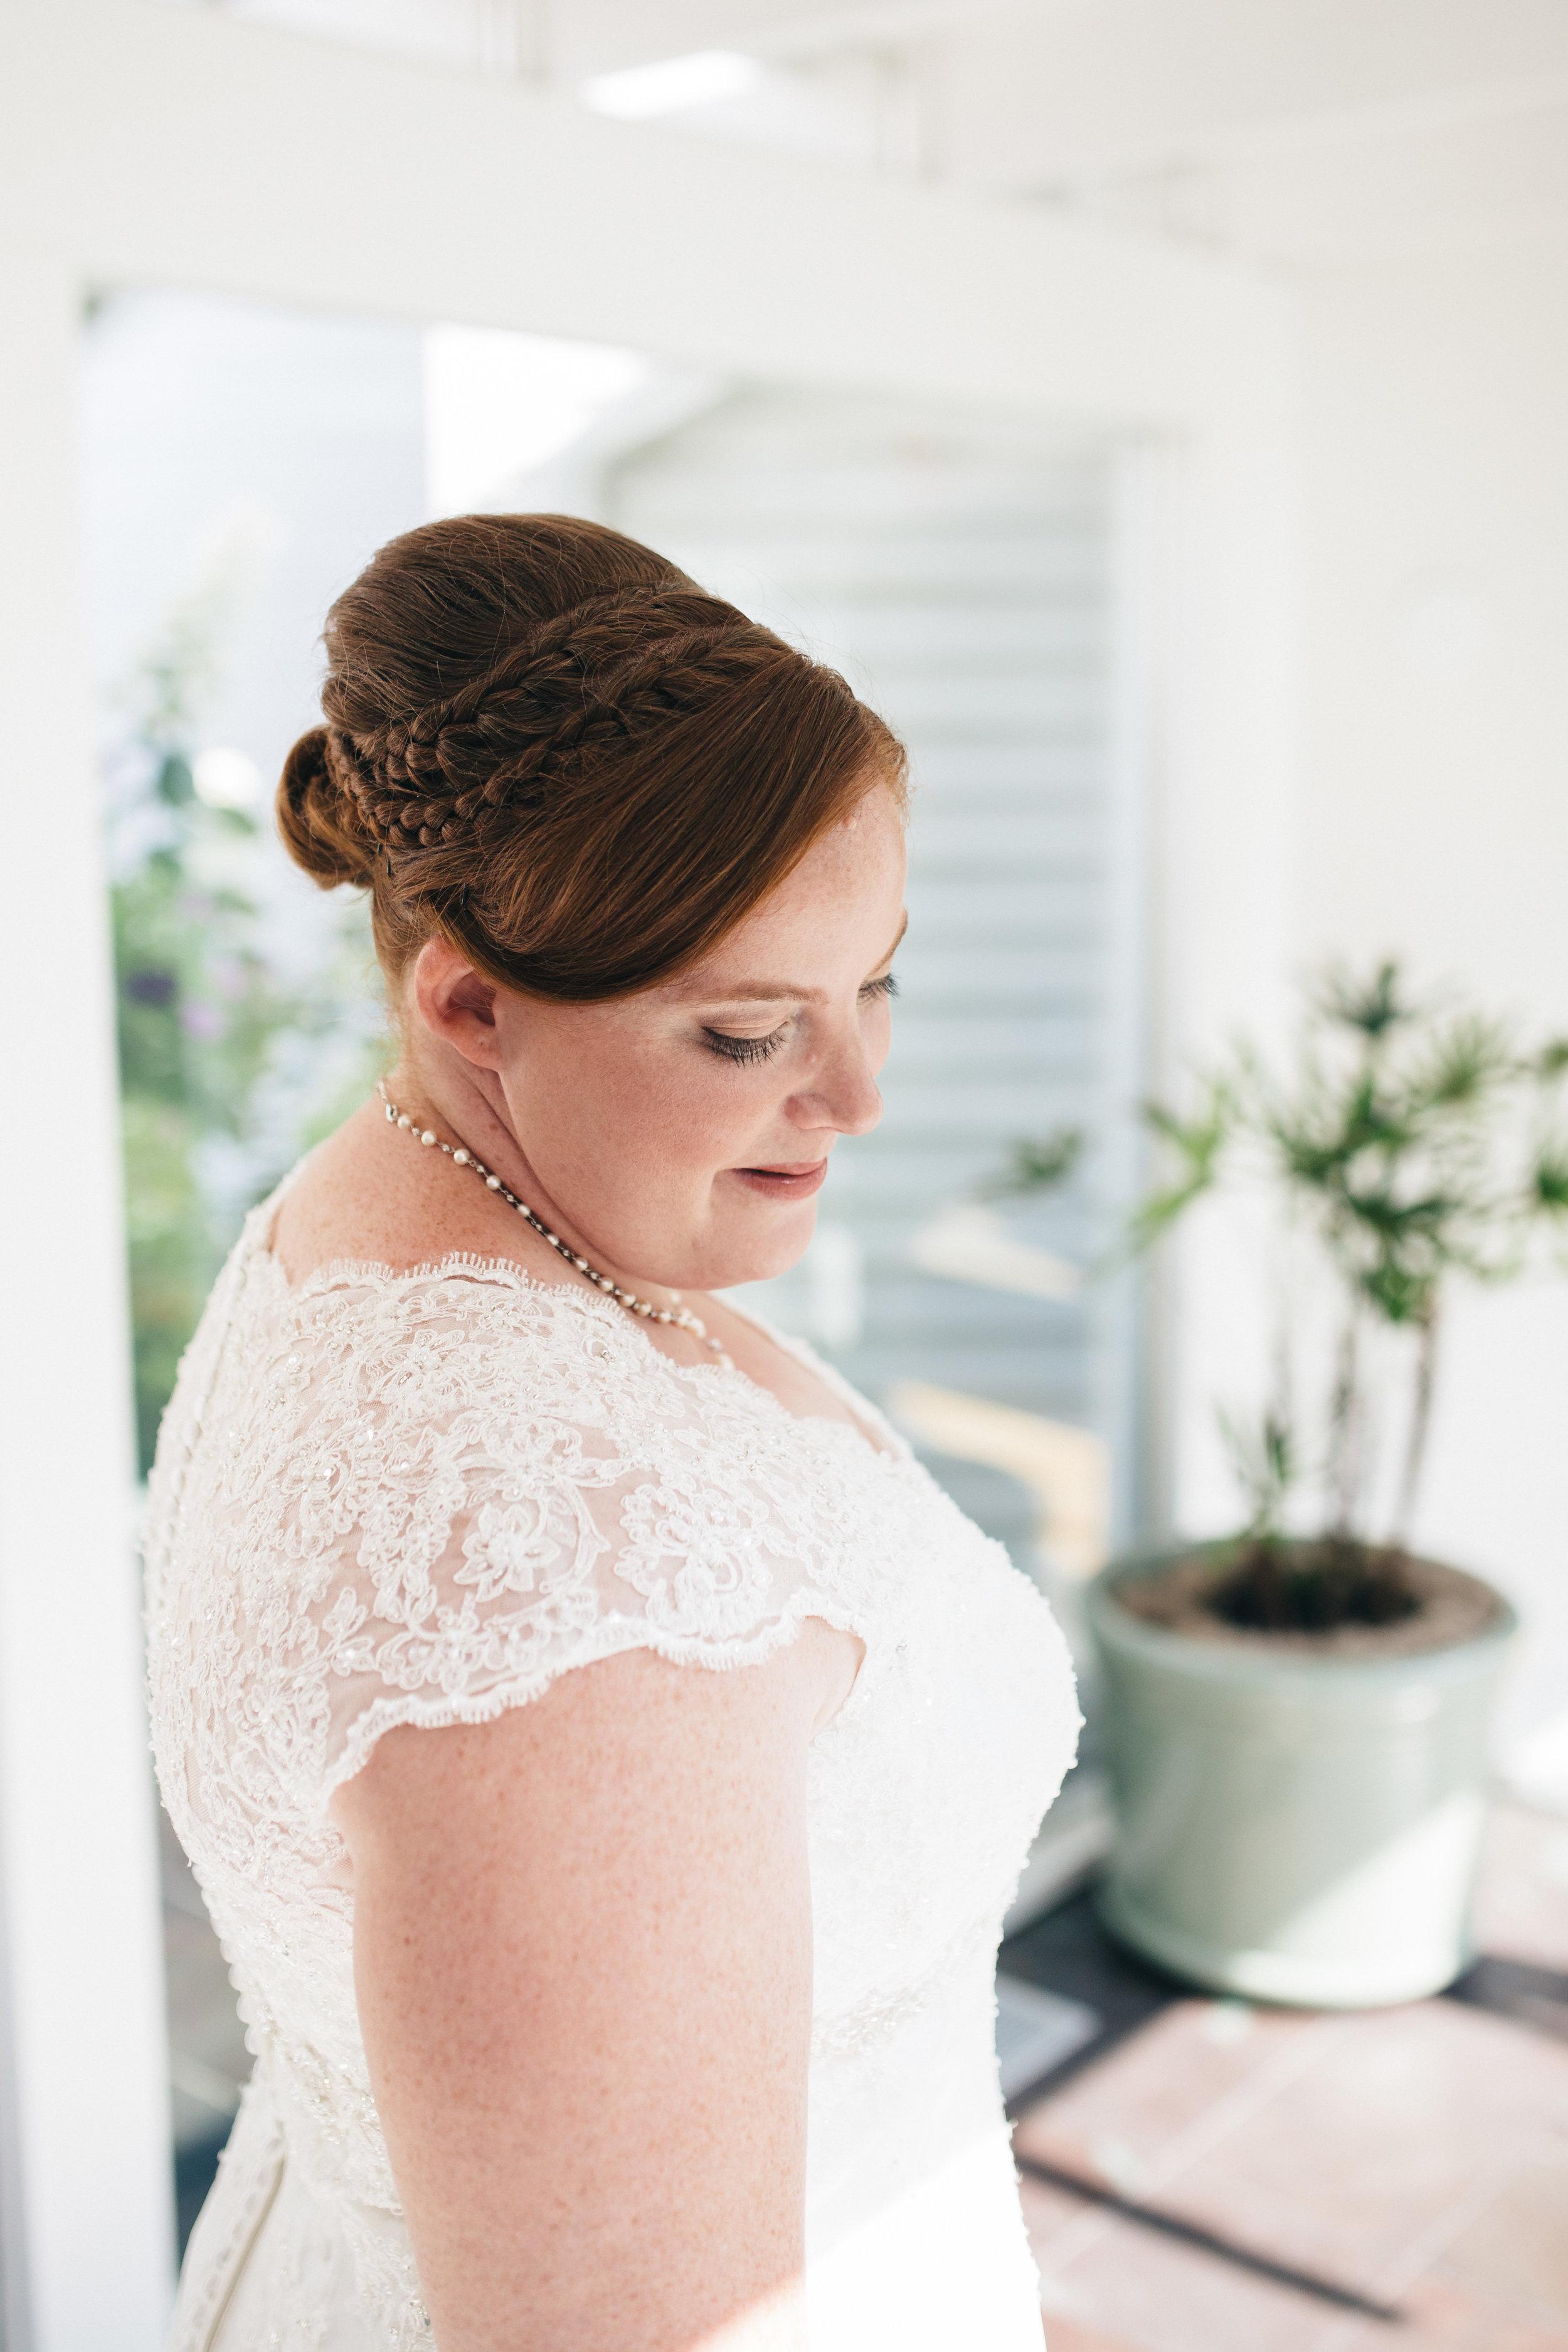 Bridal portrait in lace dress at Walden Inn & Spa Wedding.